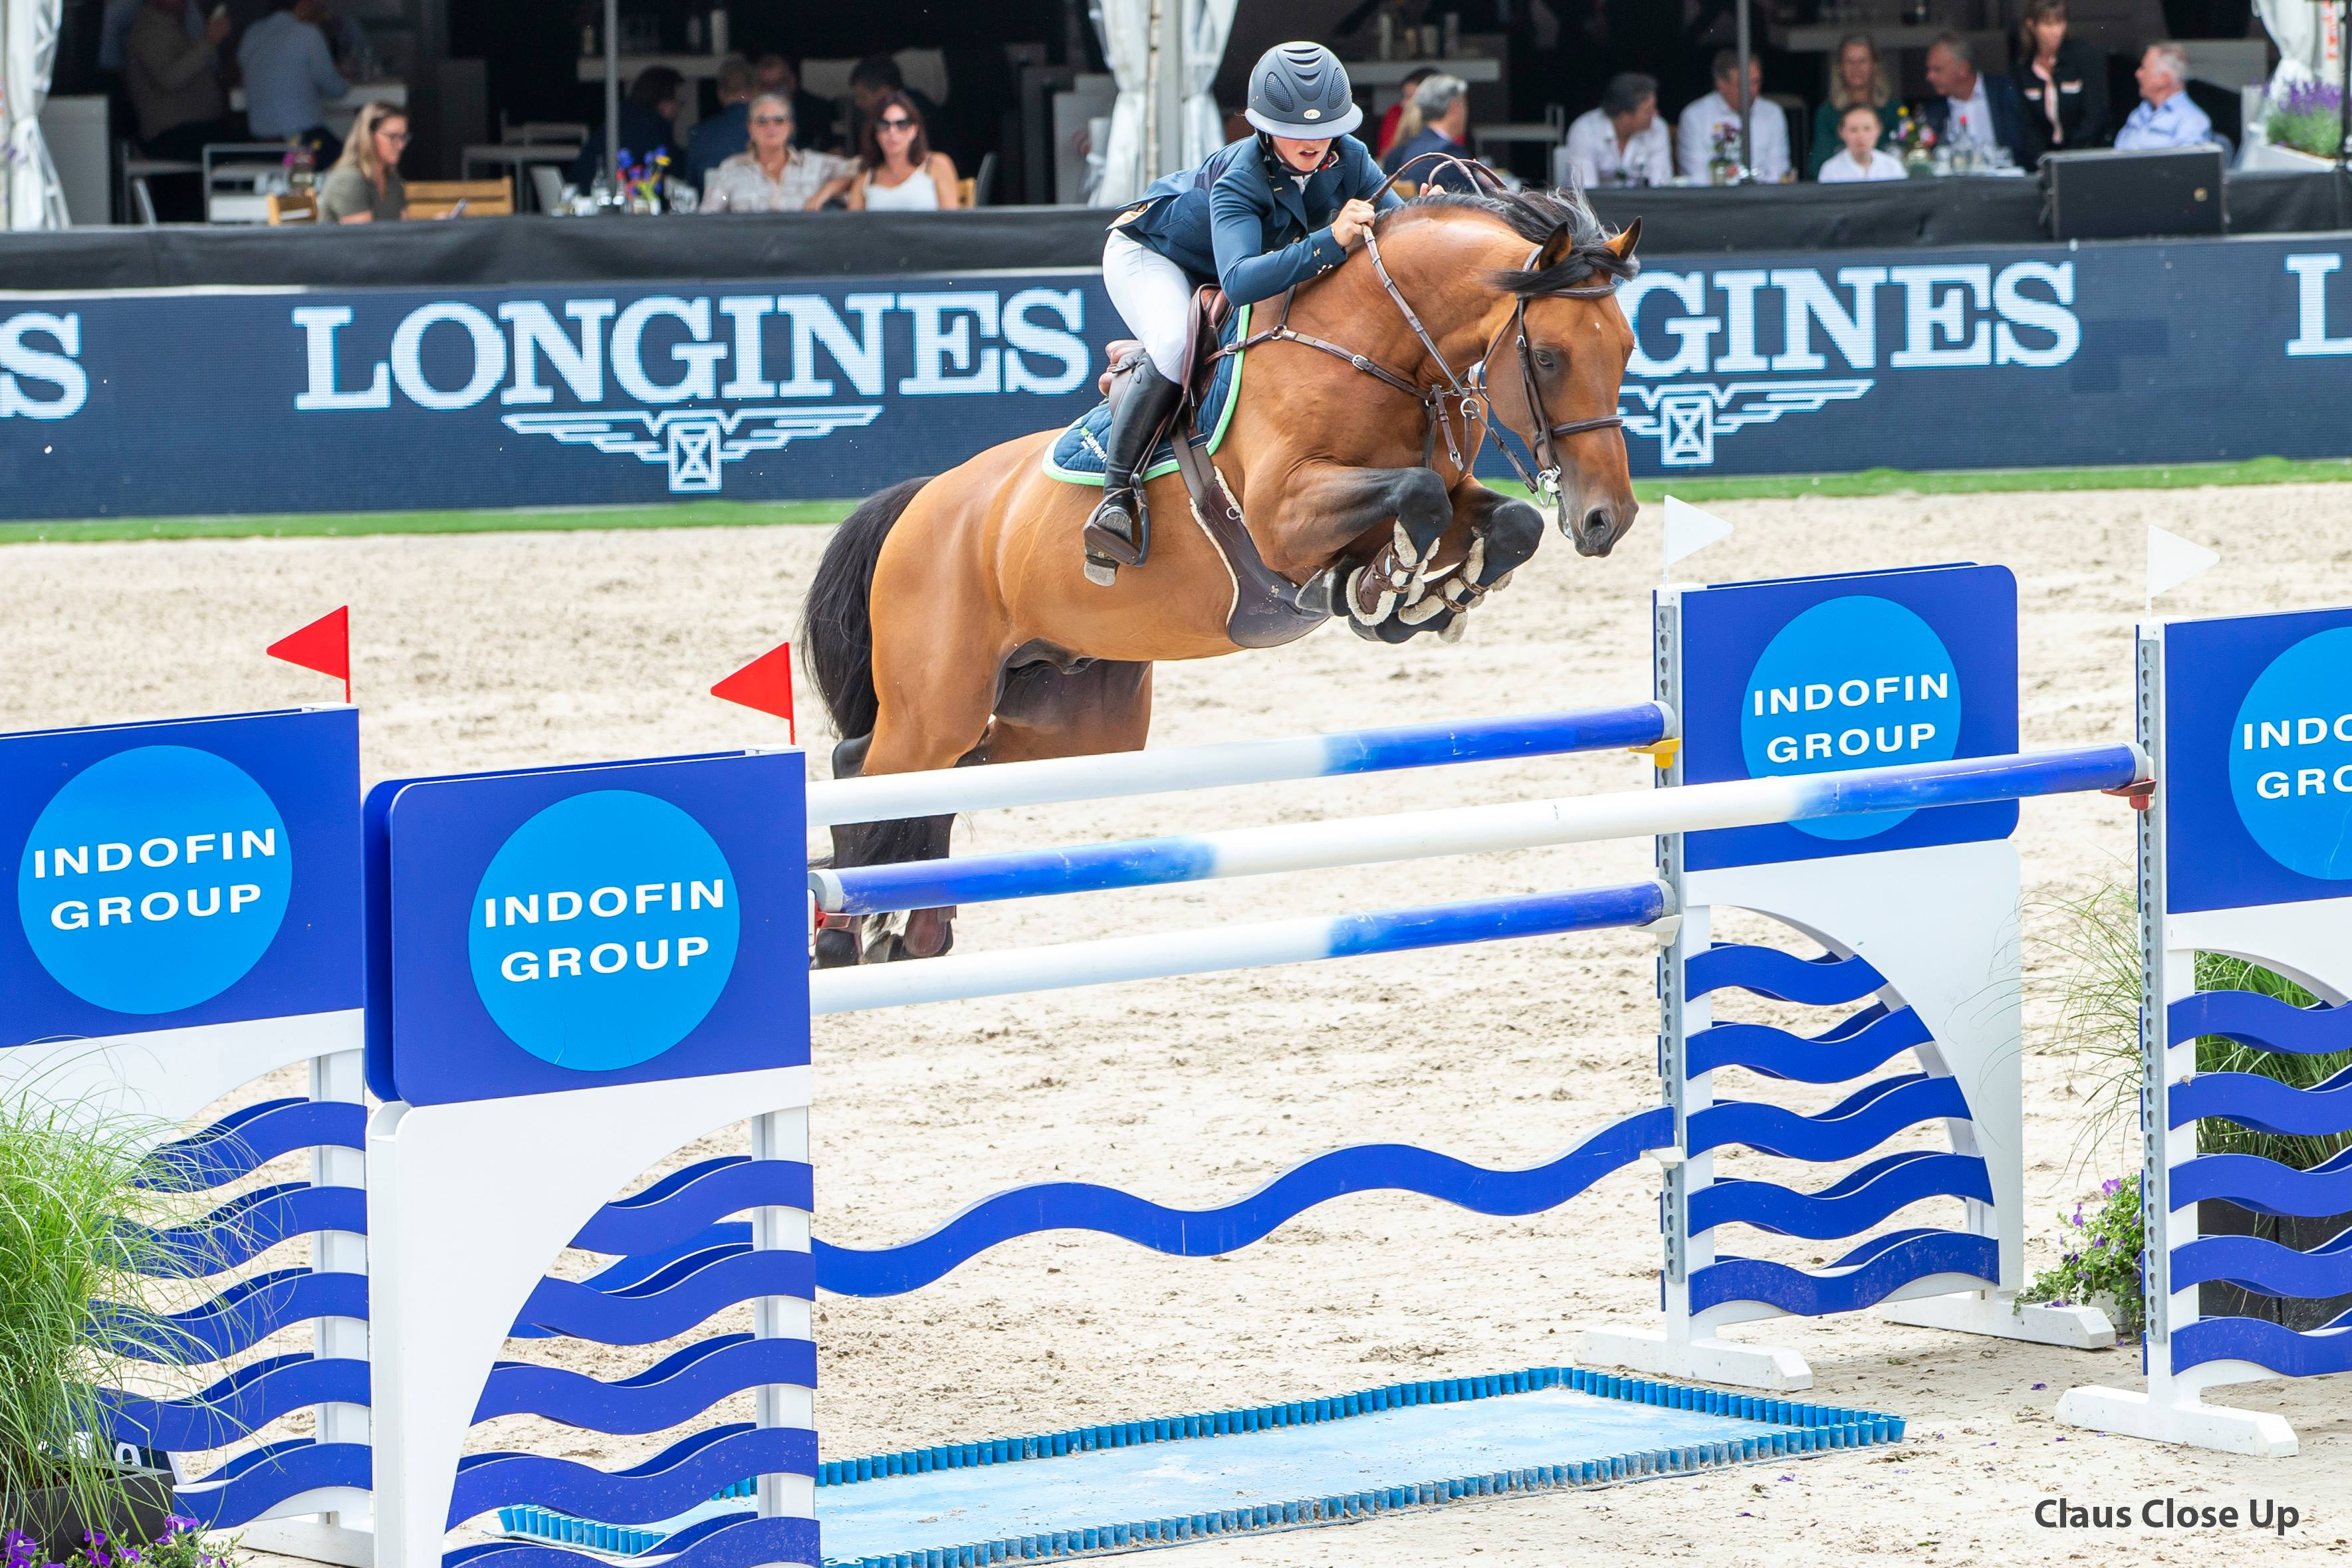 Sanne Thijssen wins Grand Prix in Rotterdam